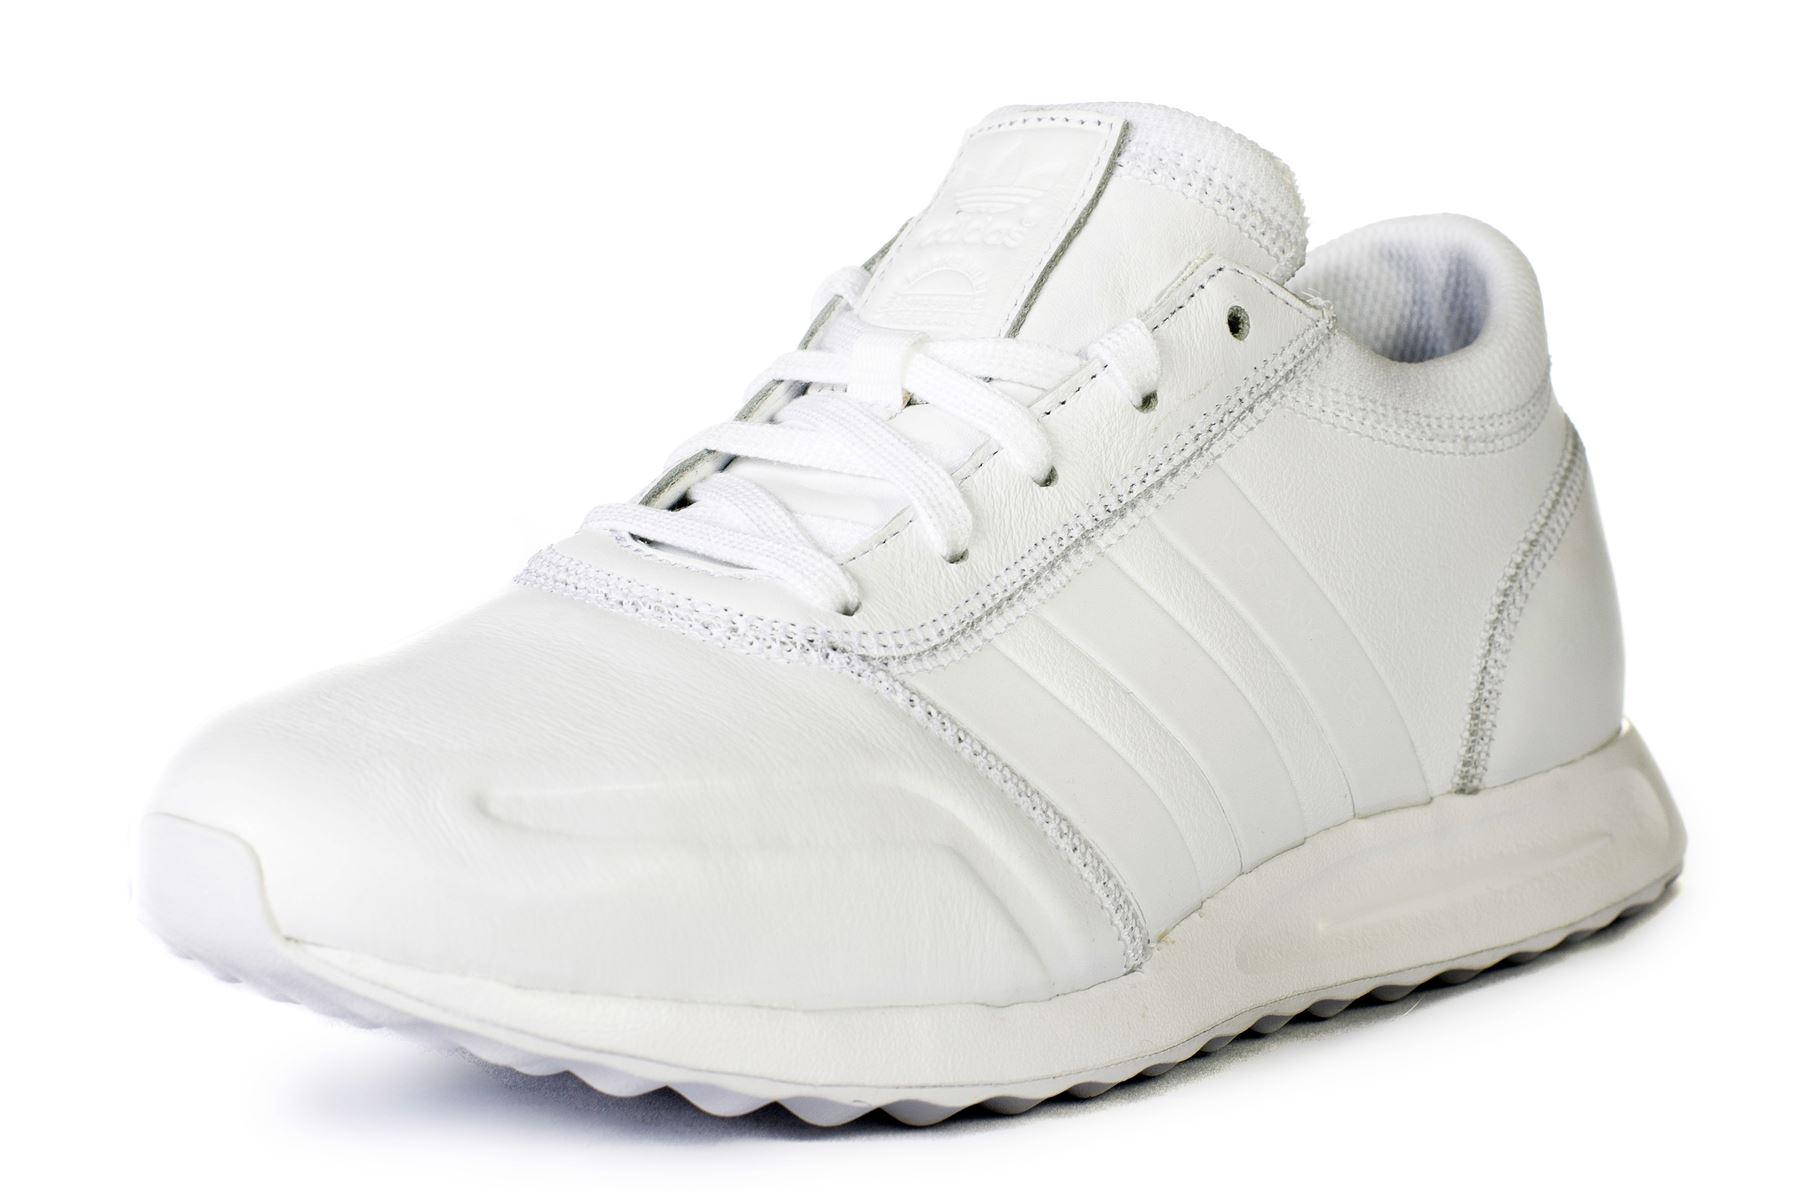 Adidas Los Angeles All White